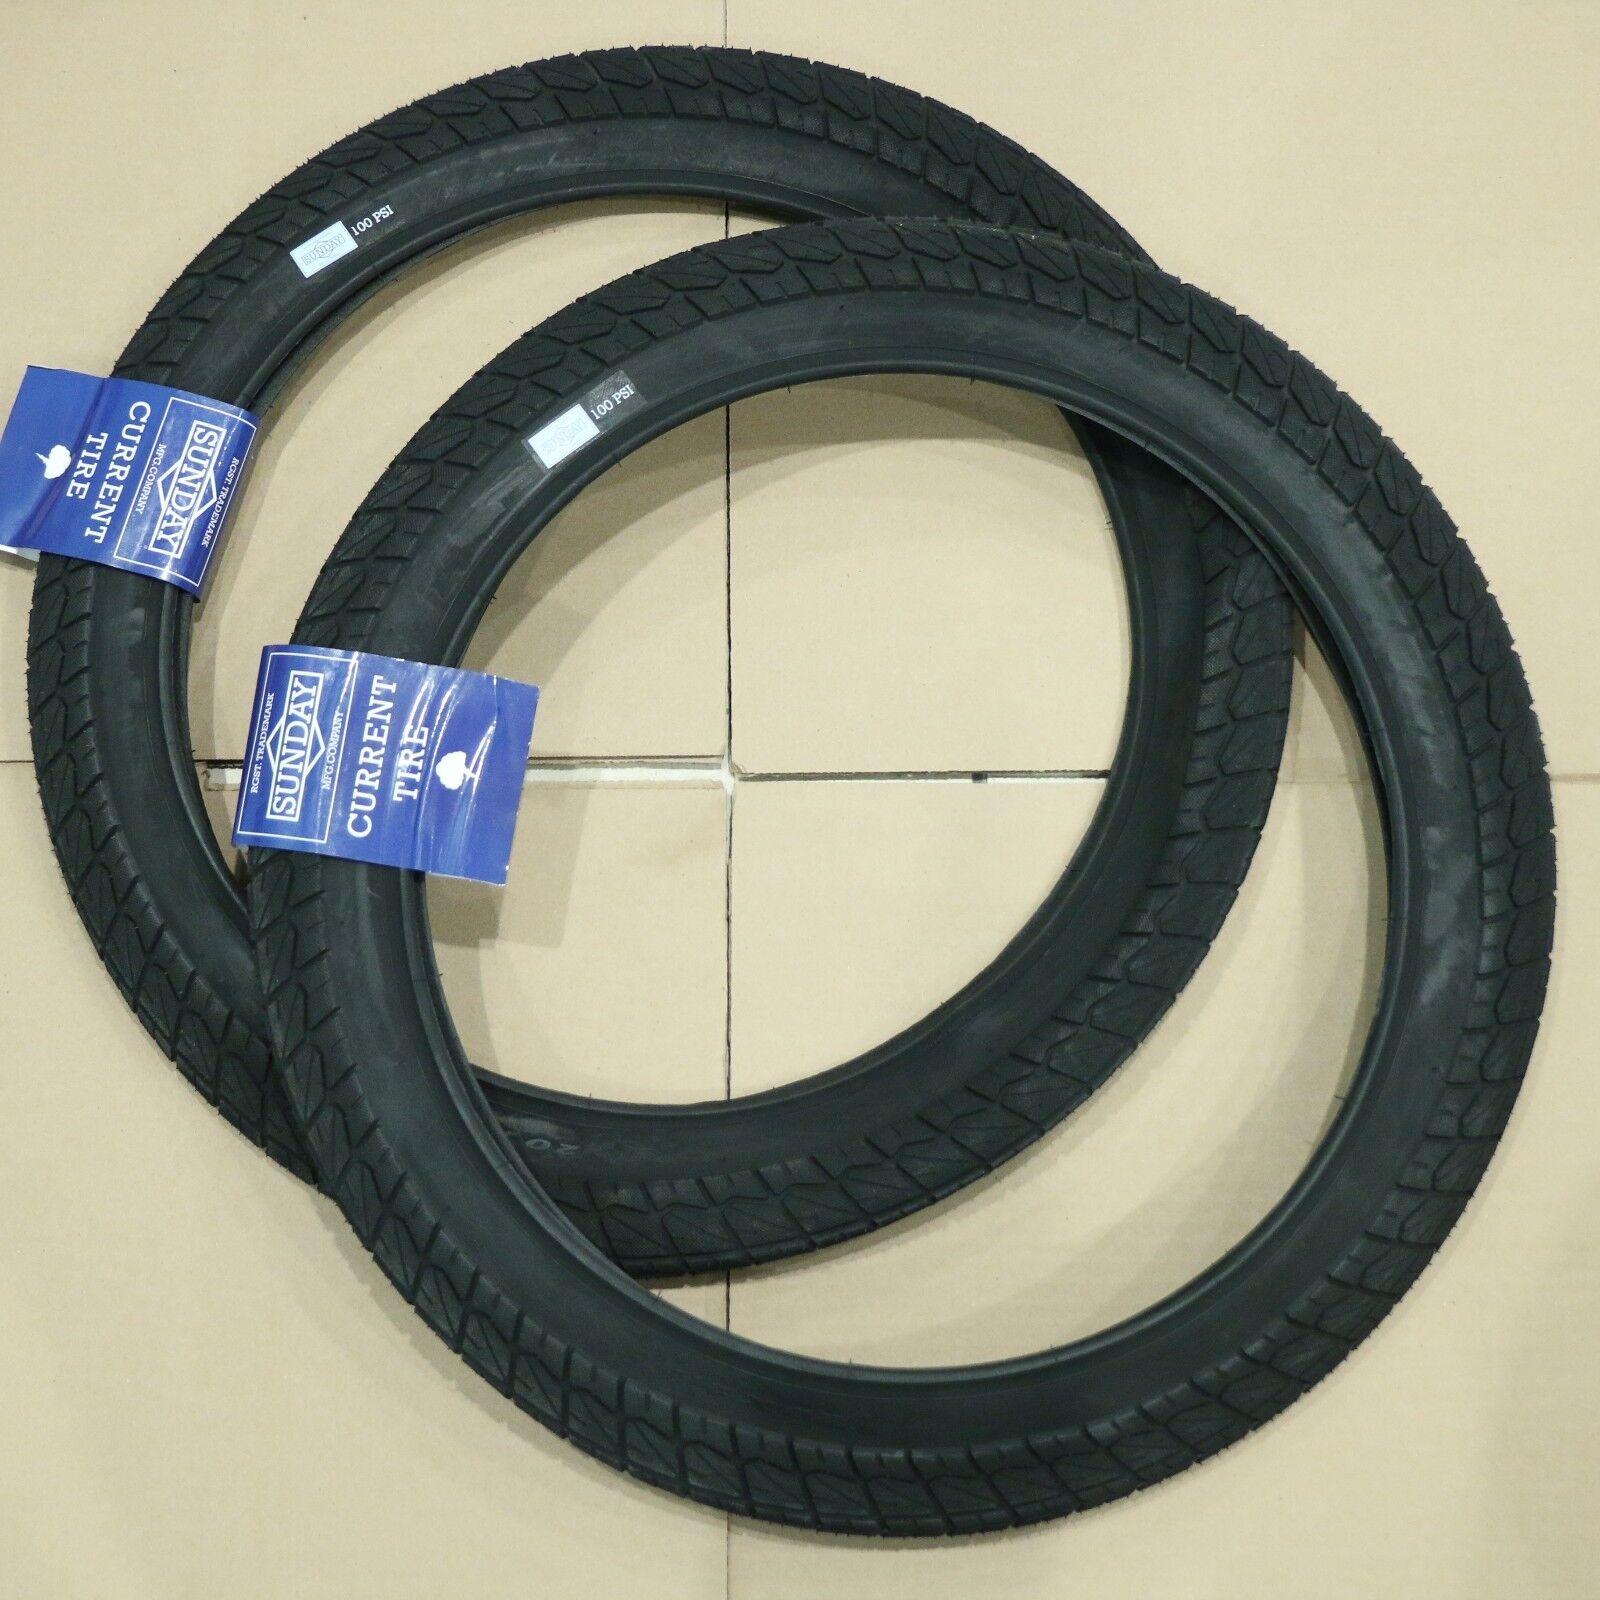 "PAIR OF SUNDAY BMX BIKE CURRENT TIRES BLACK 20 x 2.40"" PRIMO"